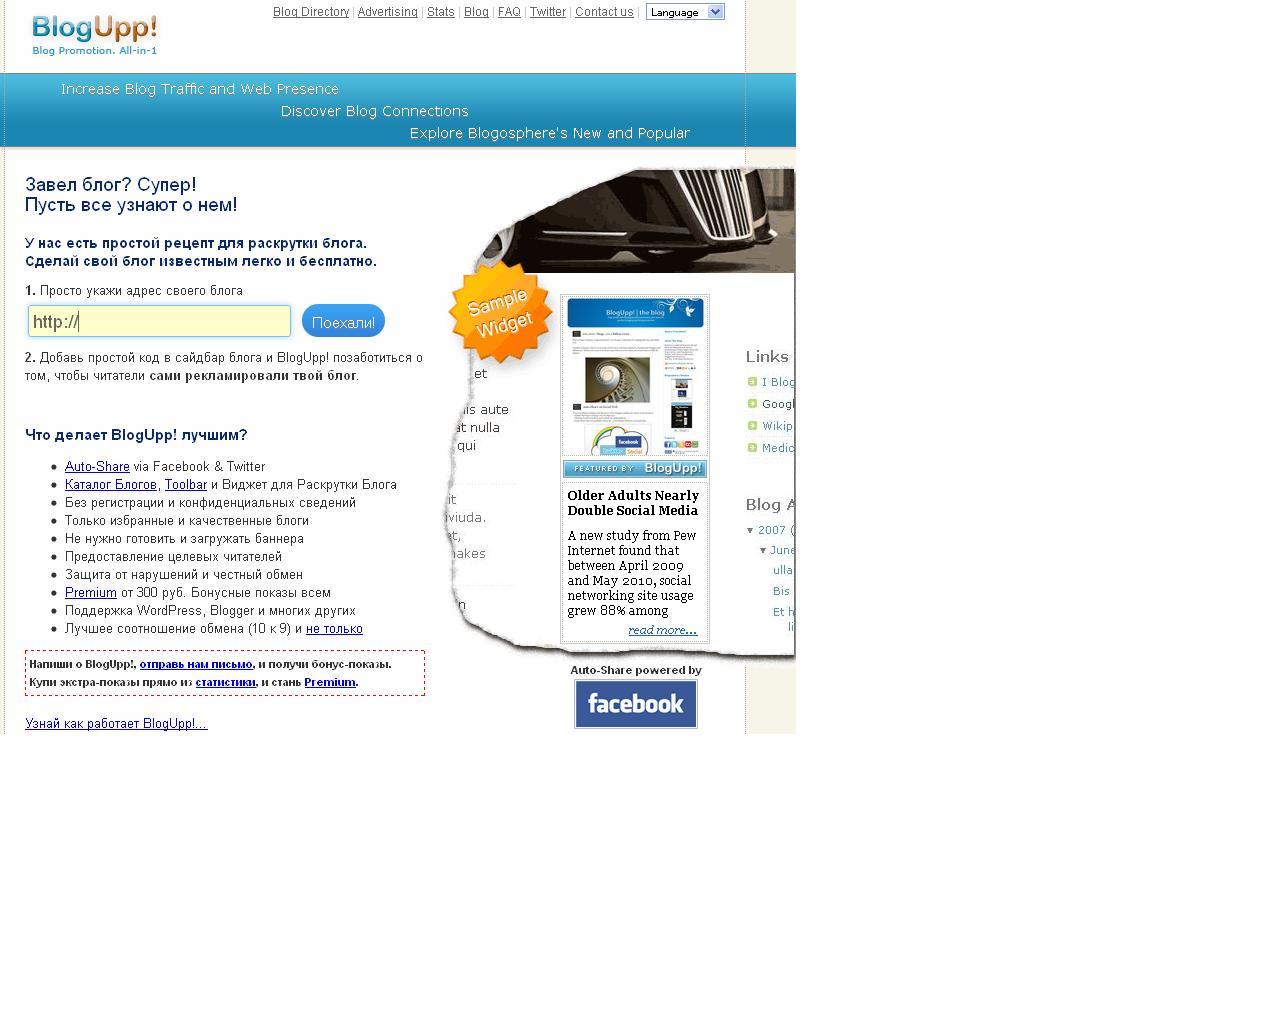 Раскрутка блога twitter seo продвижение сайта 2012